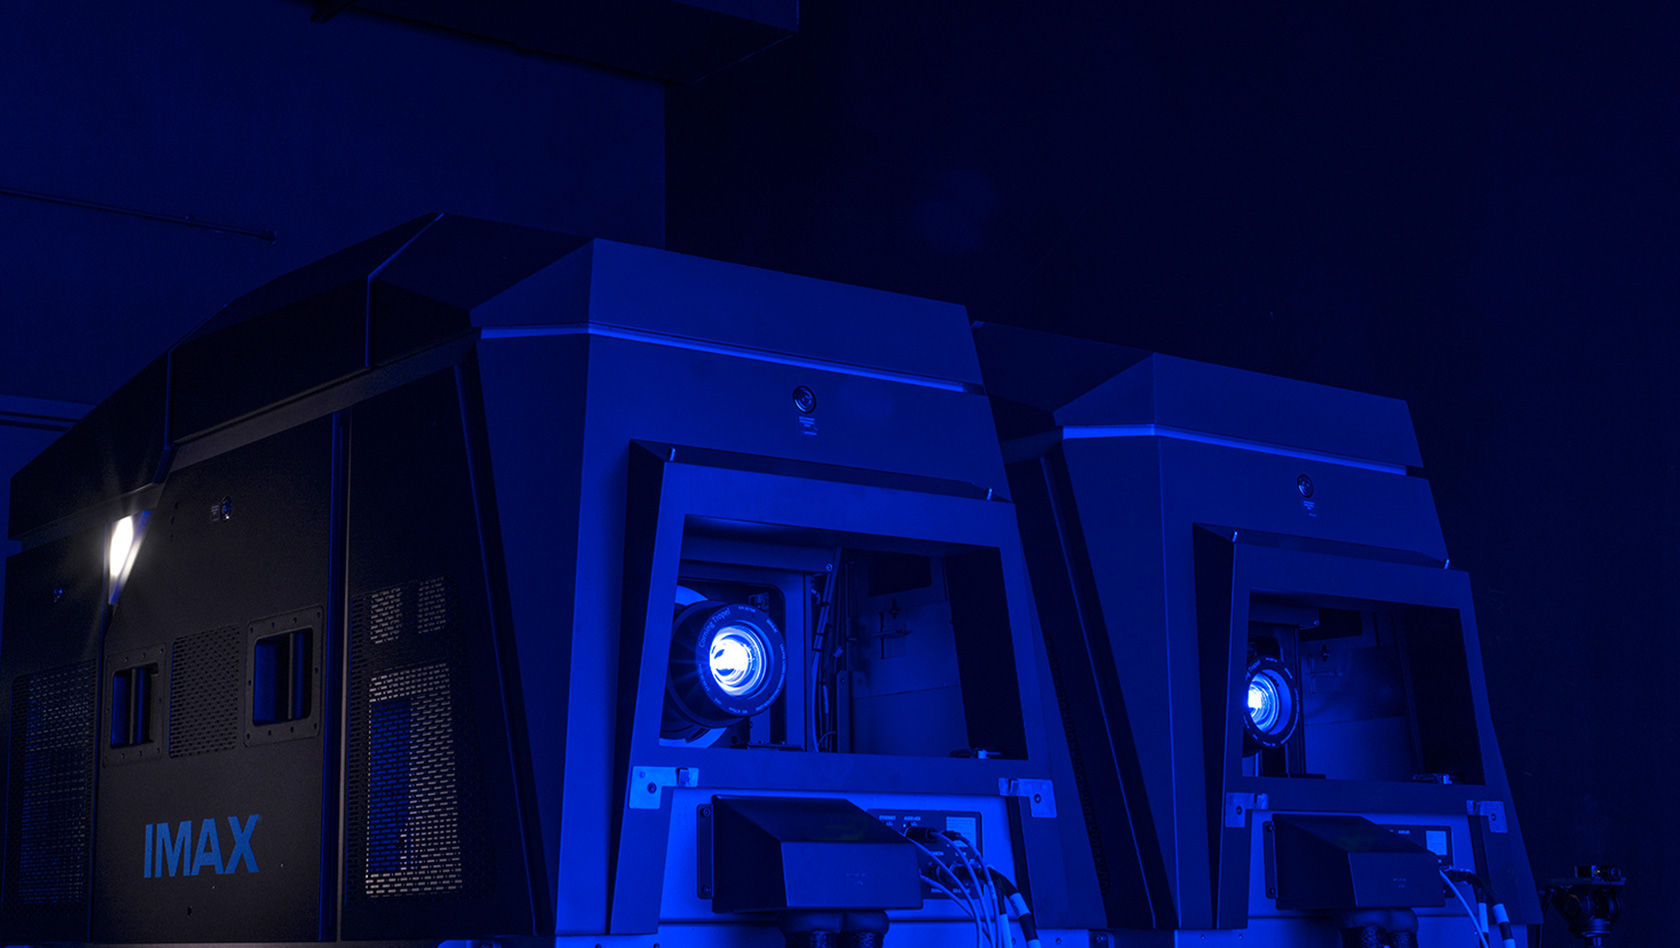 Imax 3d Laser 4k Kino Sinsheim Sinsheim